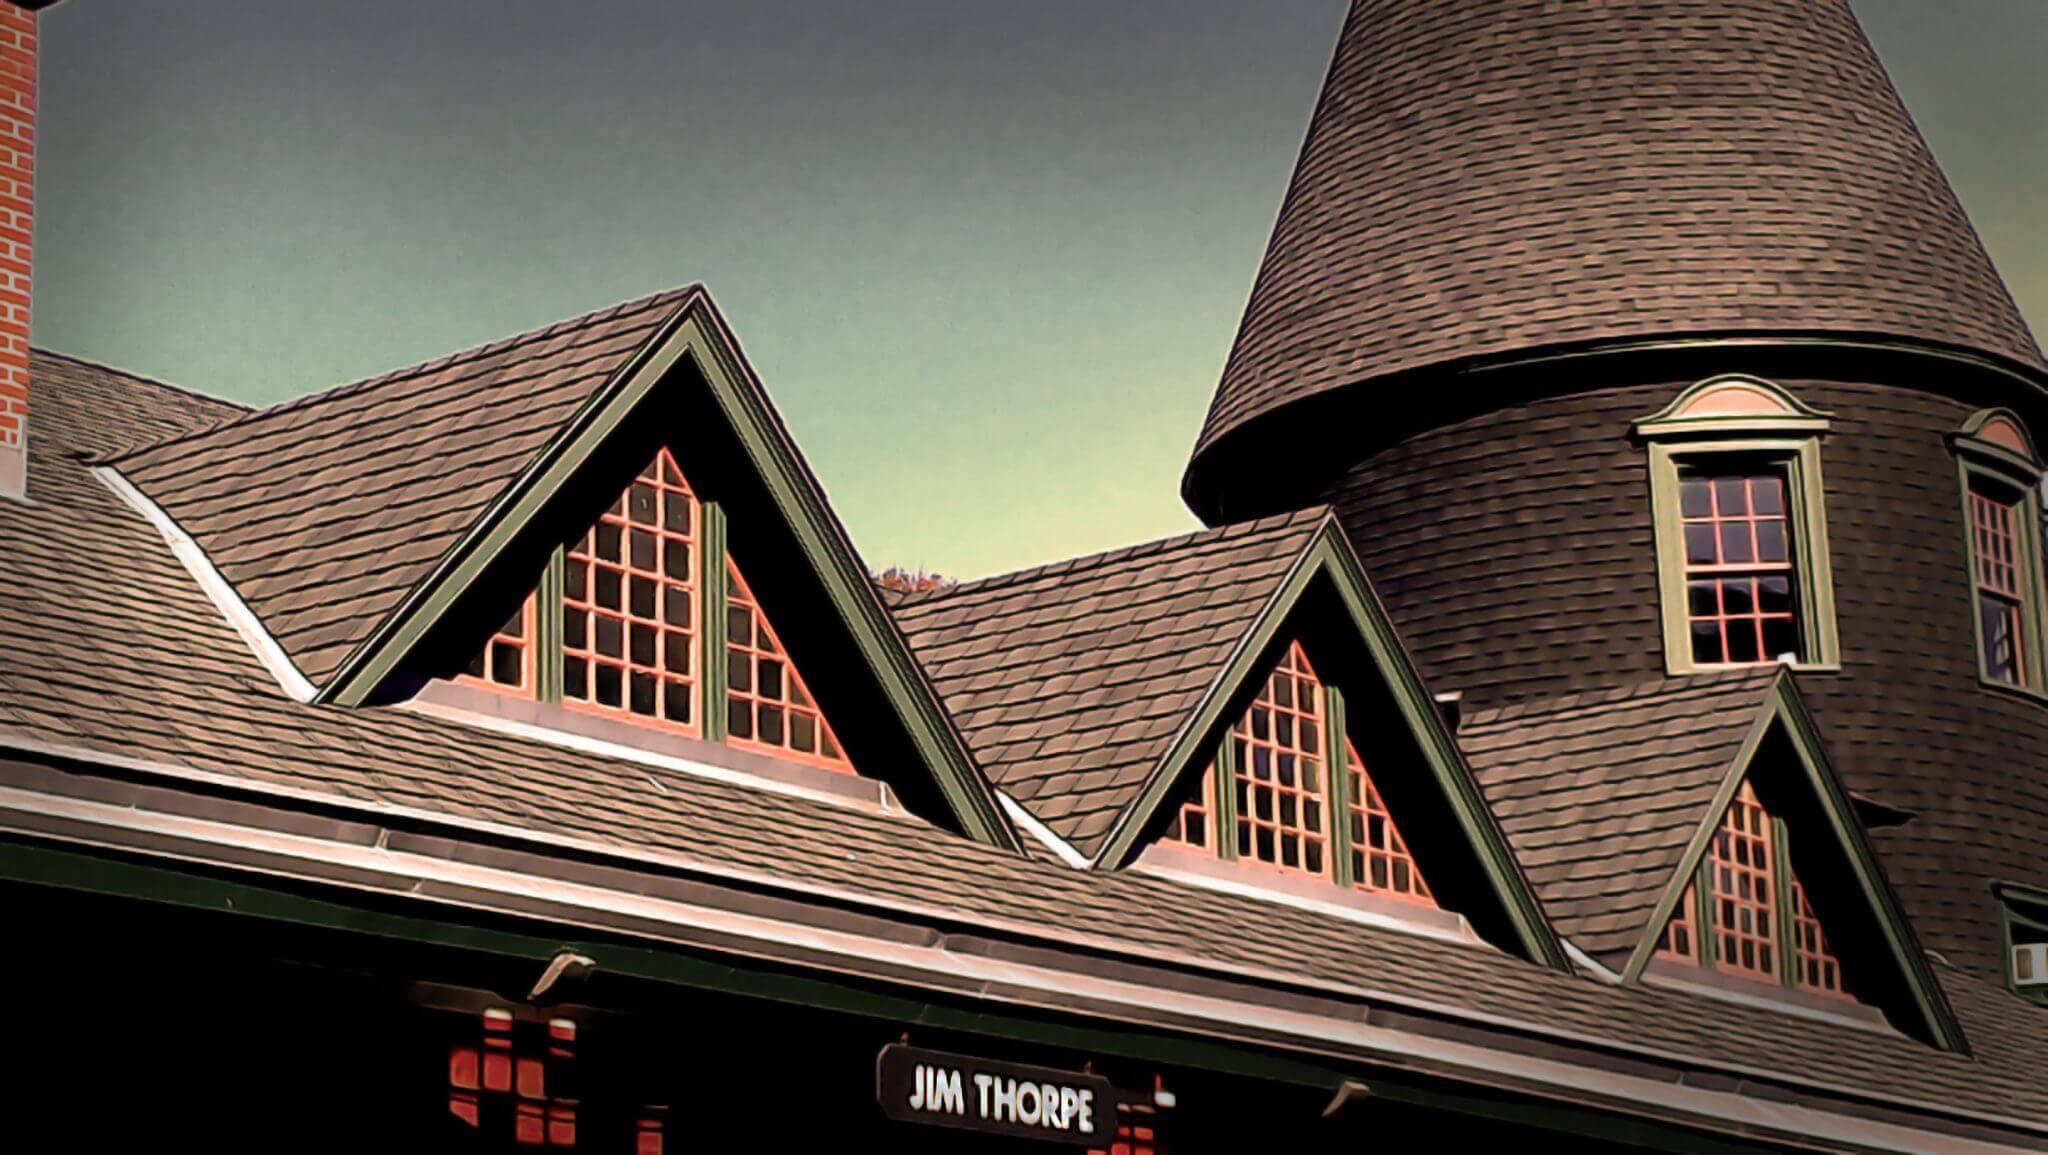 image of Jim Thorpe, PA train station